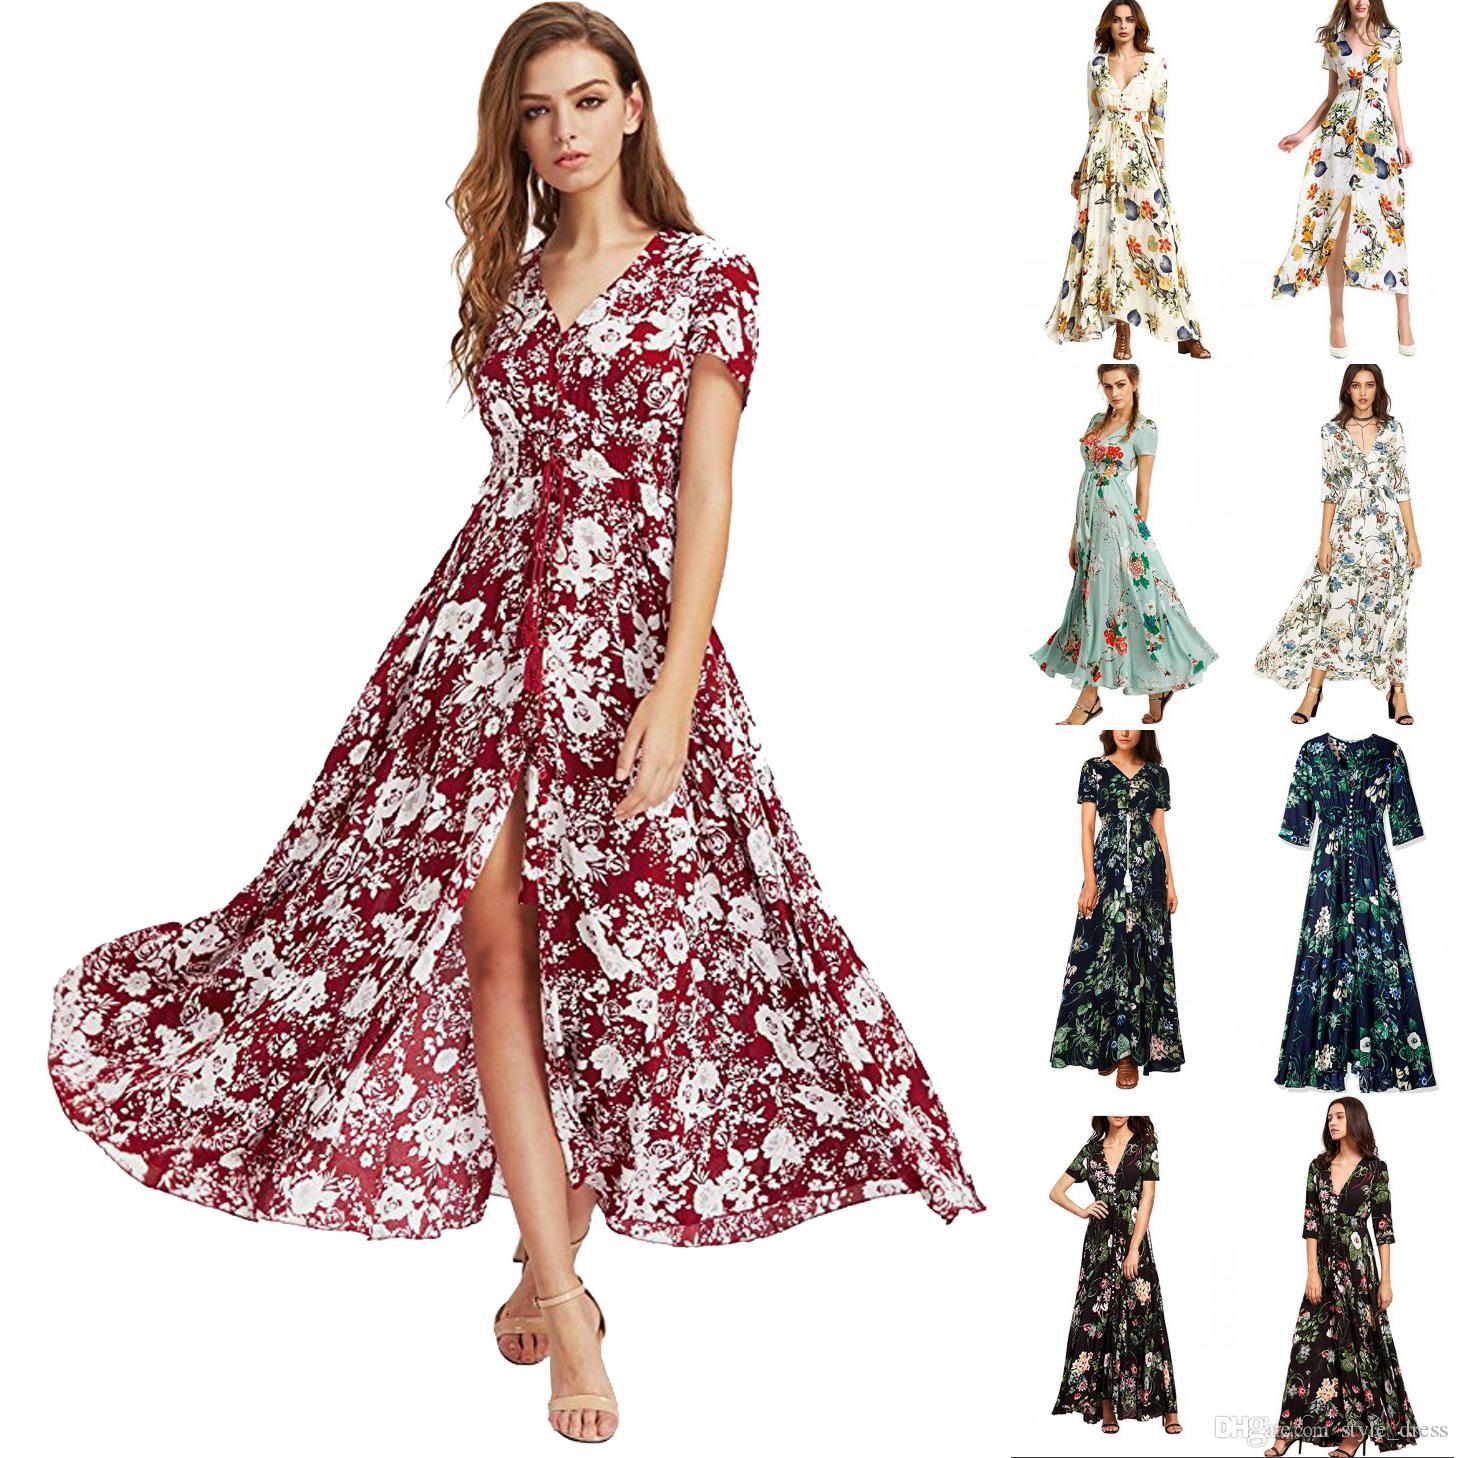 8218a2d8ba18 Boho Maxi Dress Women Summer Beach V Neck Short Sleeve Split Floral Printed  Long Party Dress Black Dress For Sale Women Black Dresses From Style dress